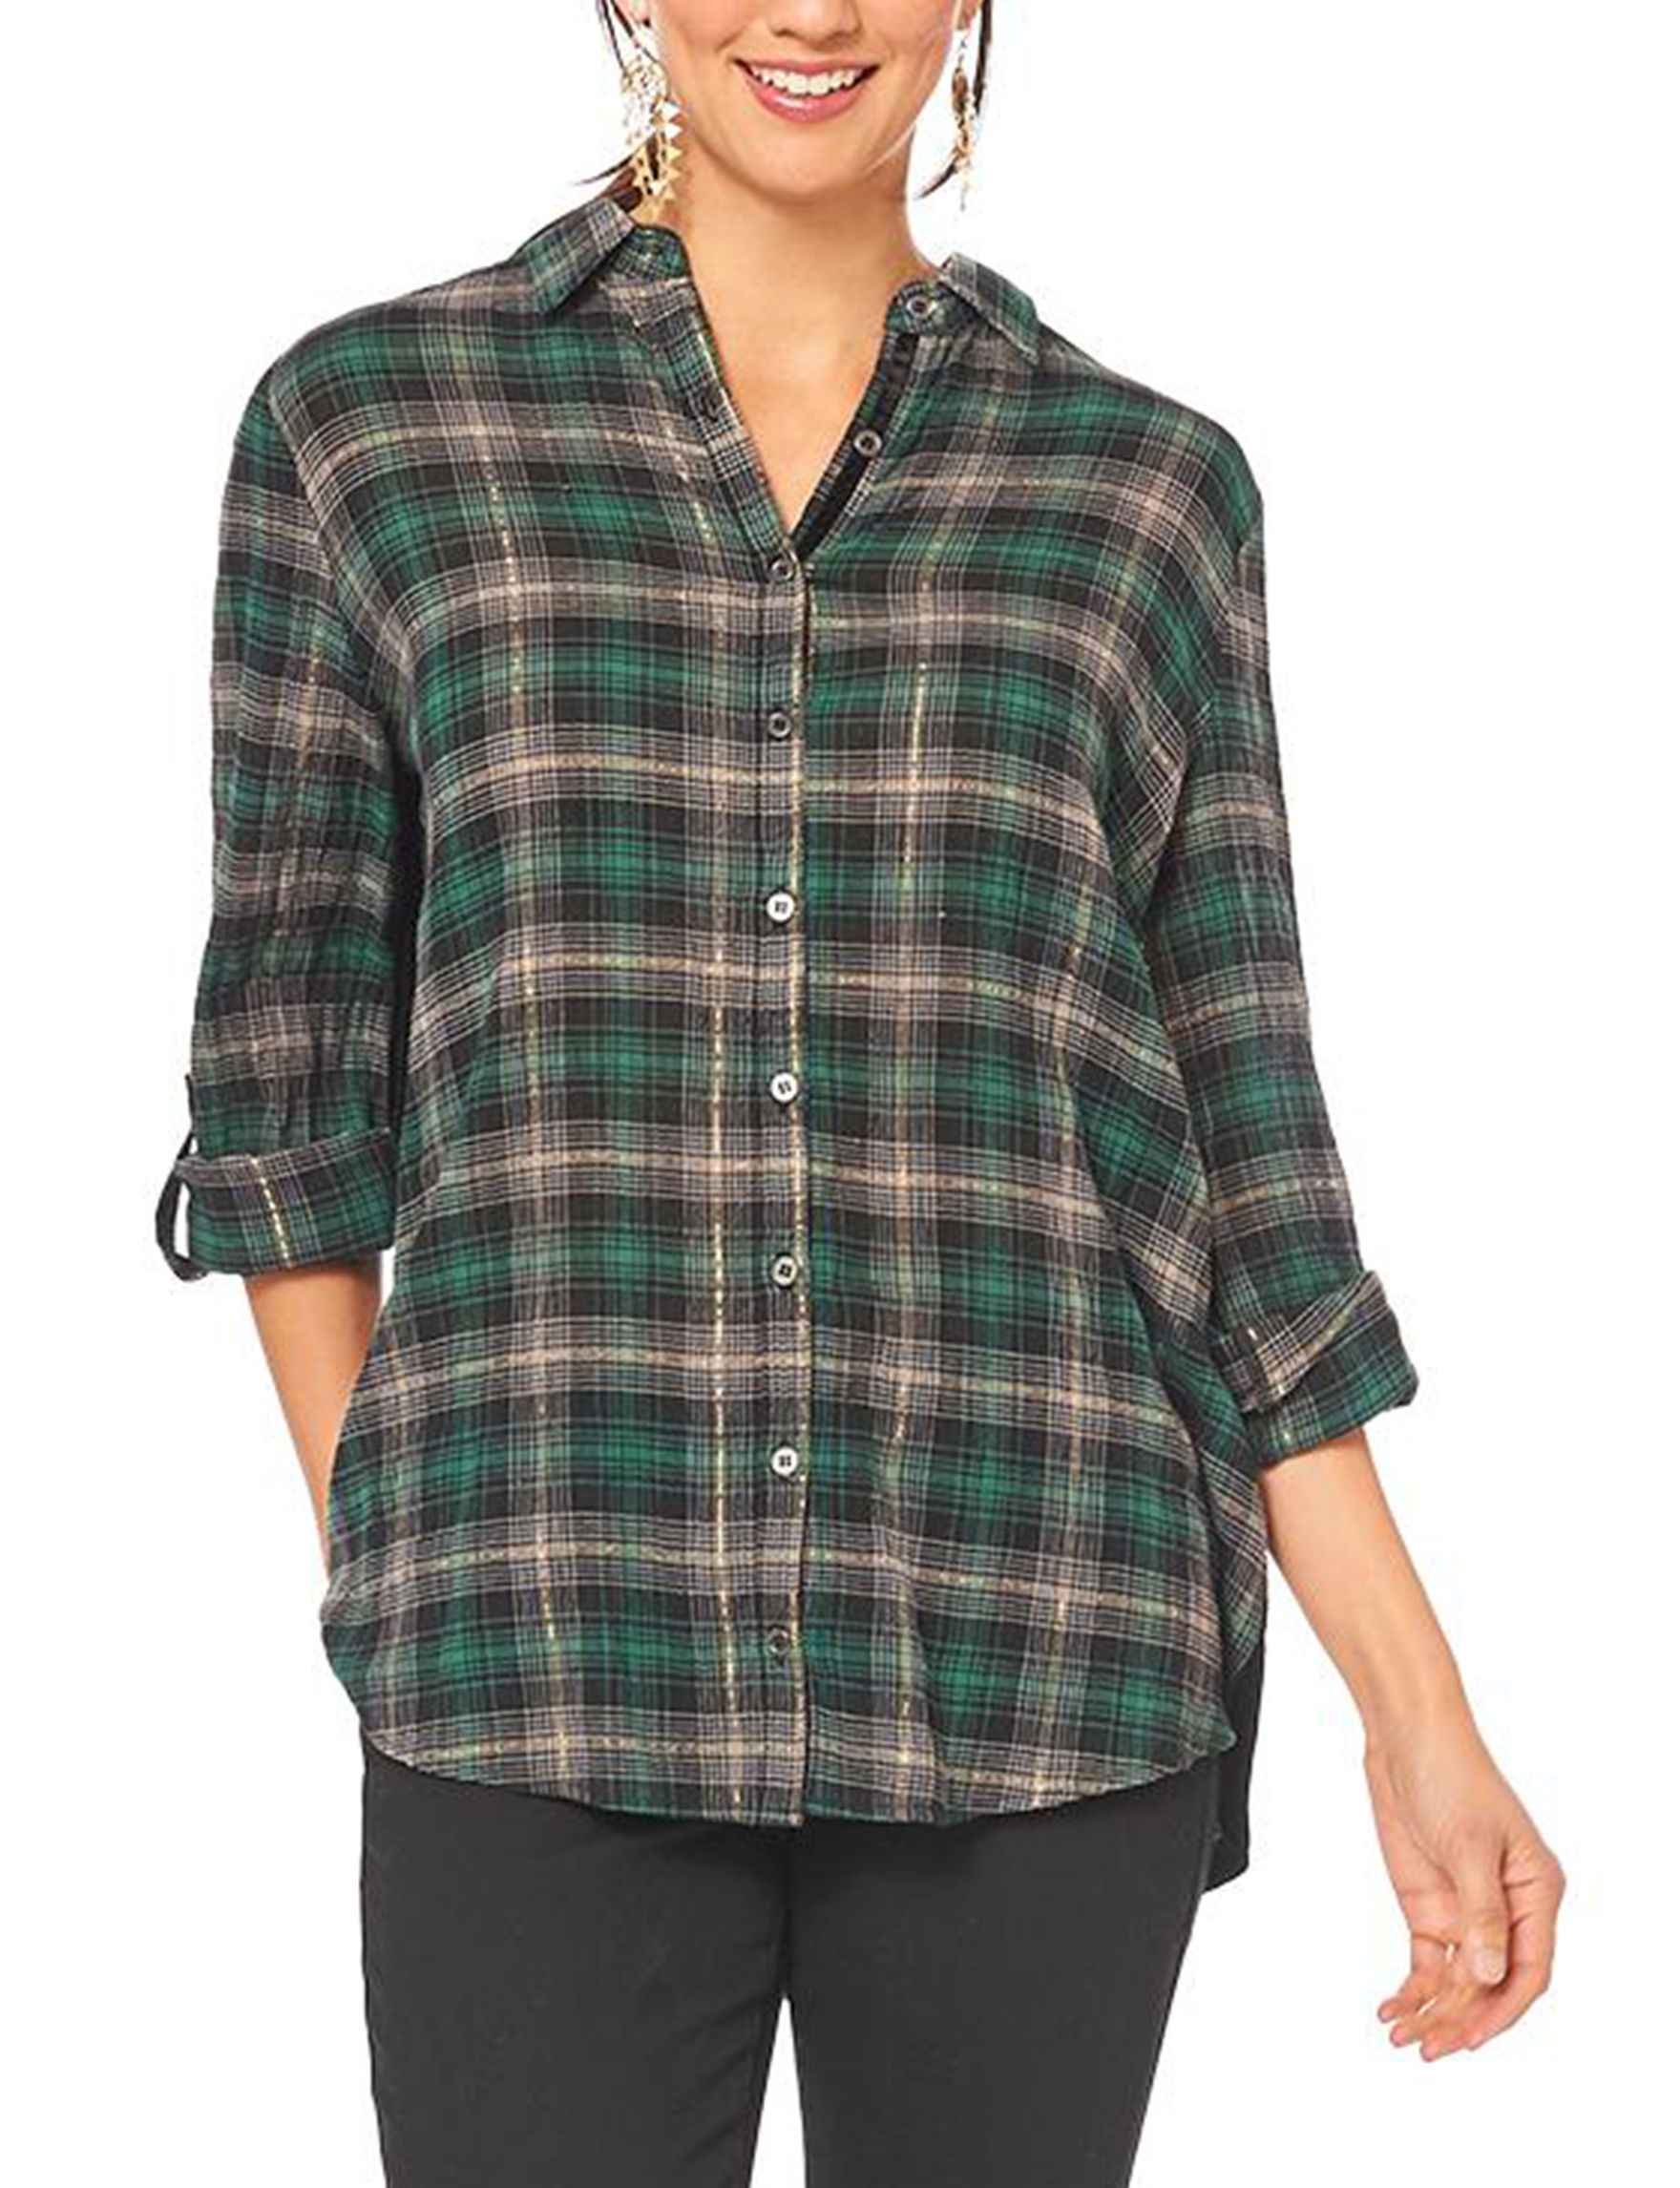 Democracy Green / Multi Shirts & Blouses